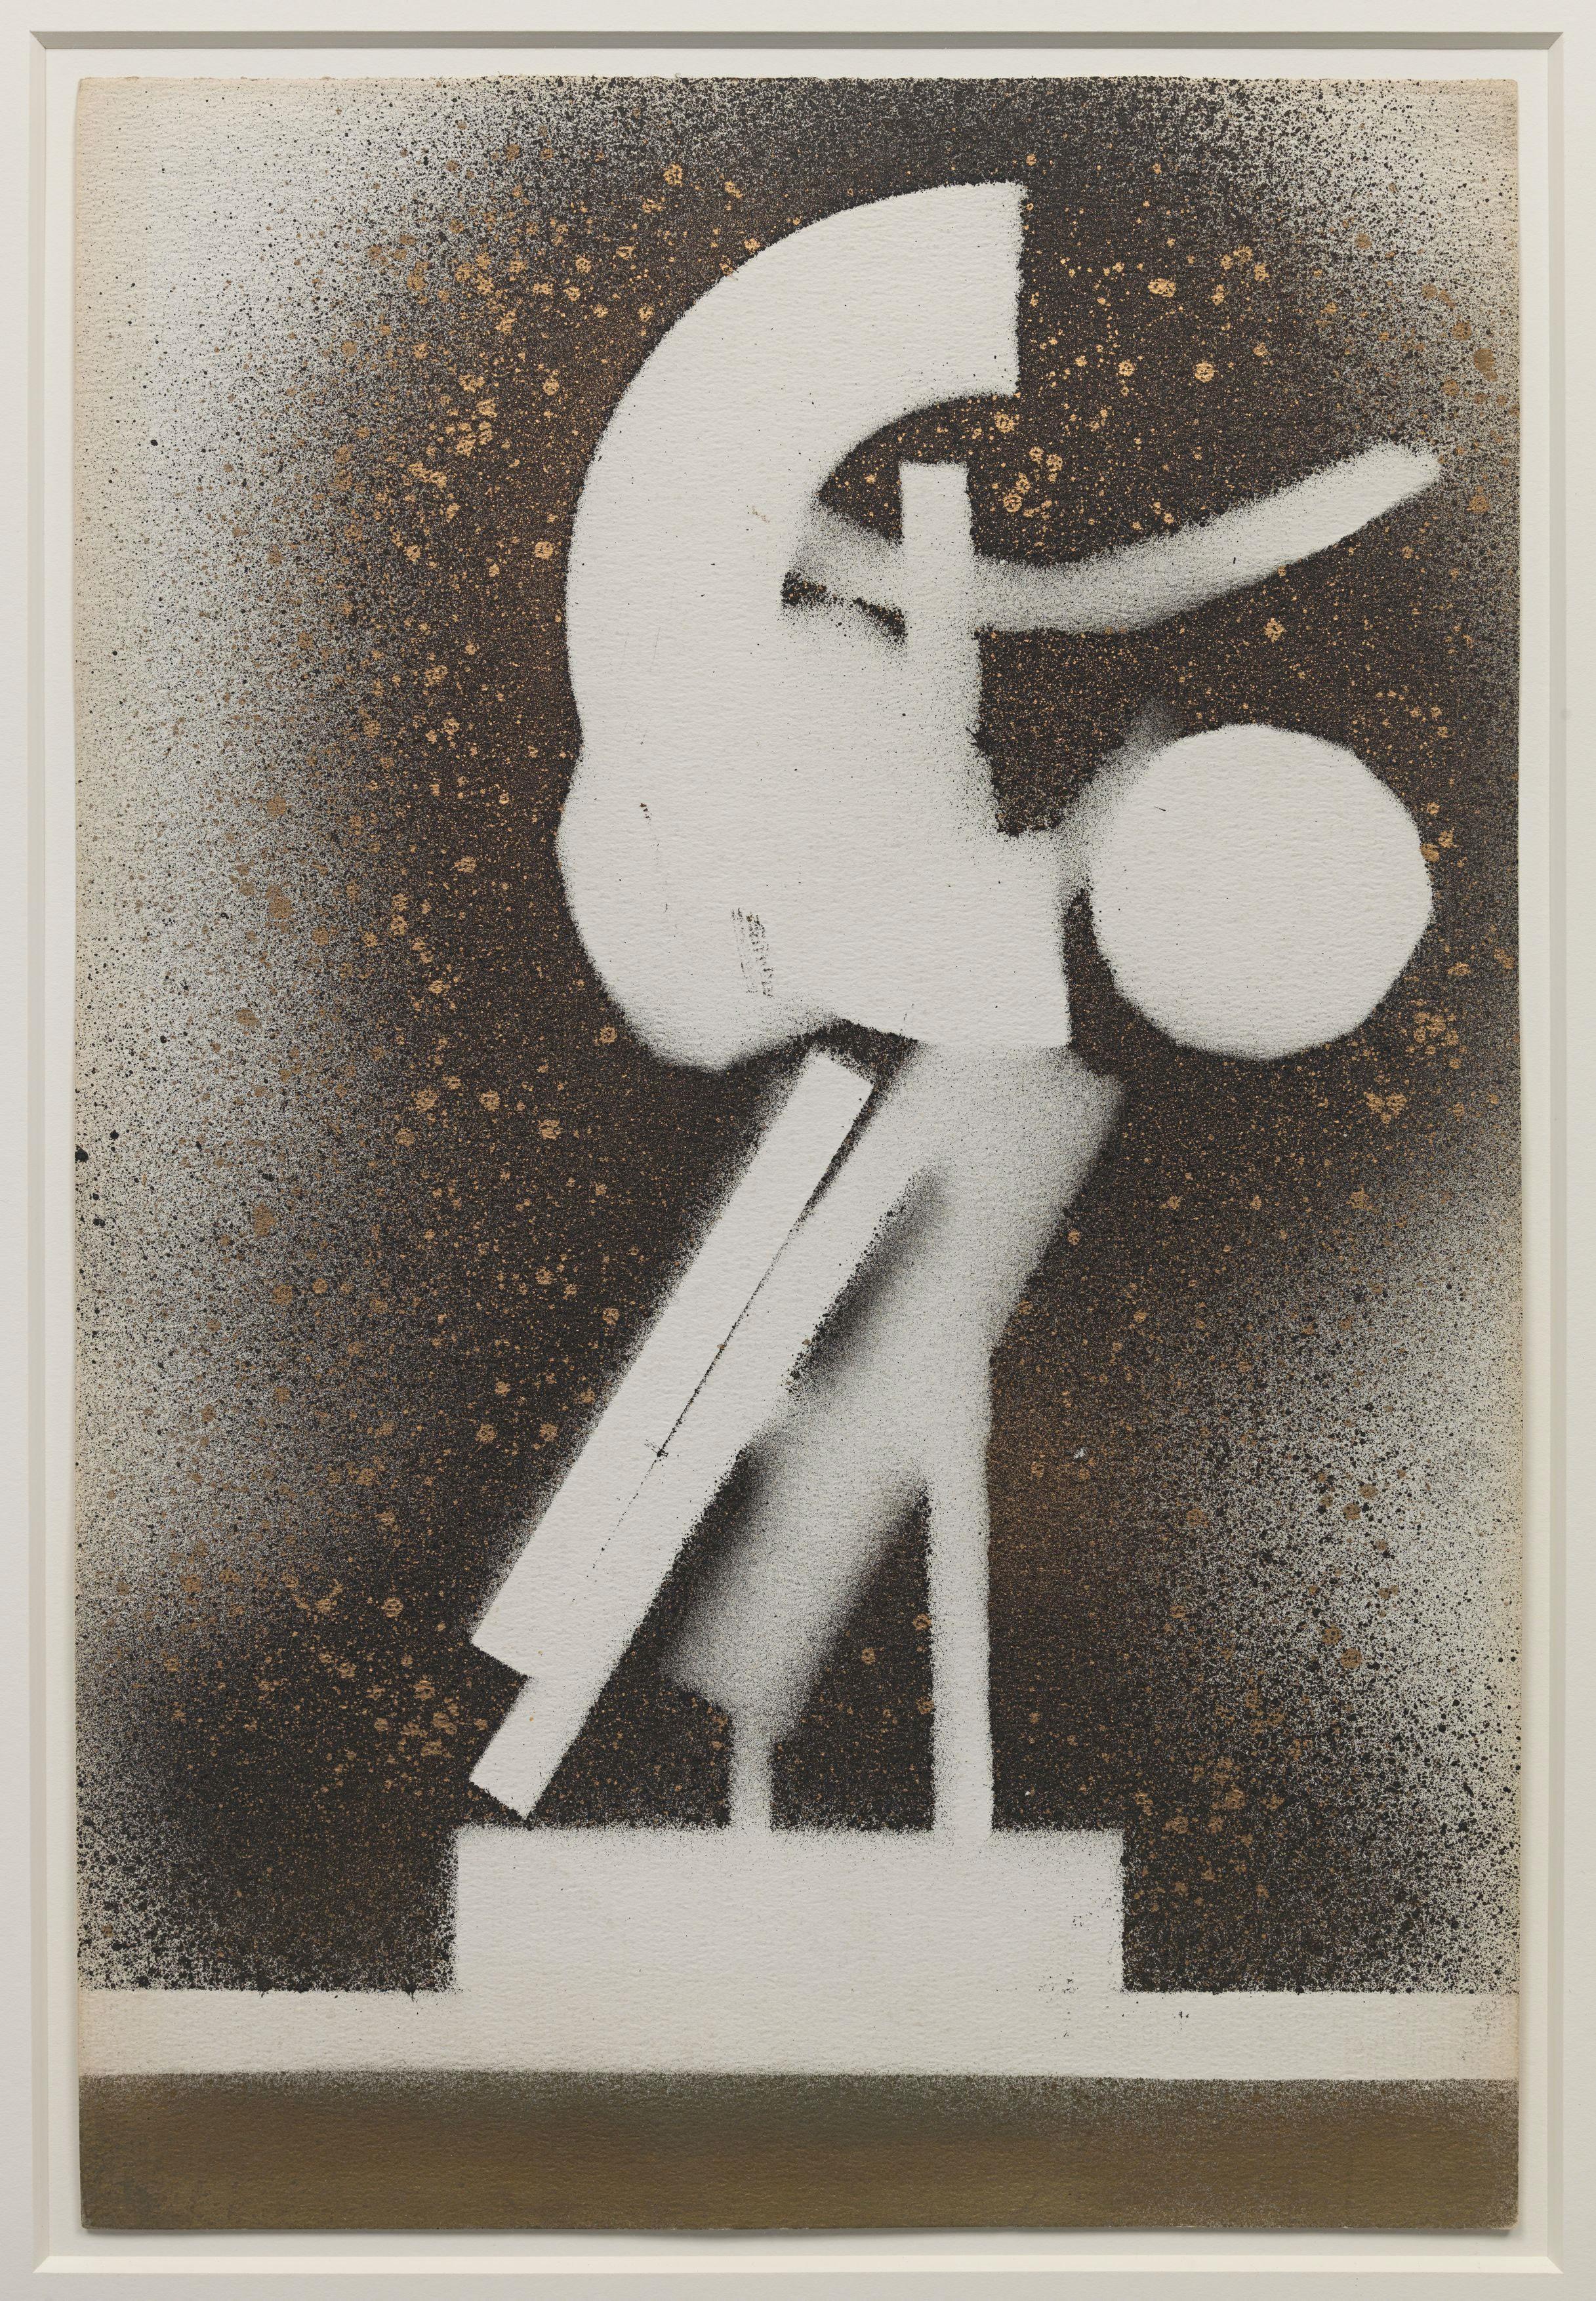 David Smith, <em>Untitled (Arc)</em>, 1959–60. Spray enamel on paper, 17 1/4 x 11 1/2 inches. The Estate of David Smith. Photo: Genevieve Hanson. © 2021 The Estate of David Smith / Licensed by VAGA at Artists Rights Society (ARS), NY.